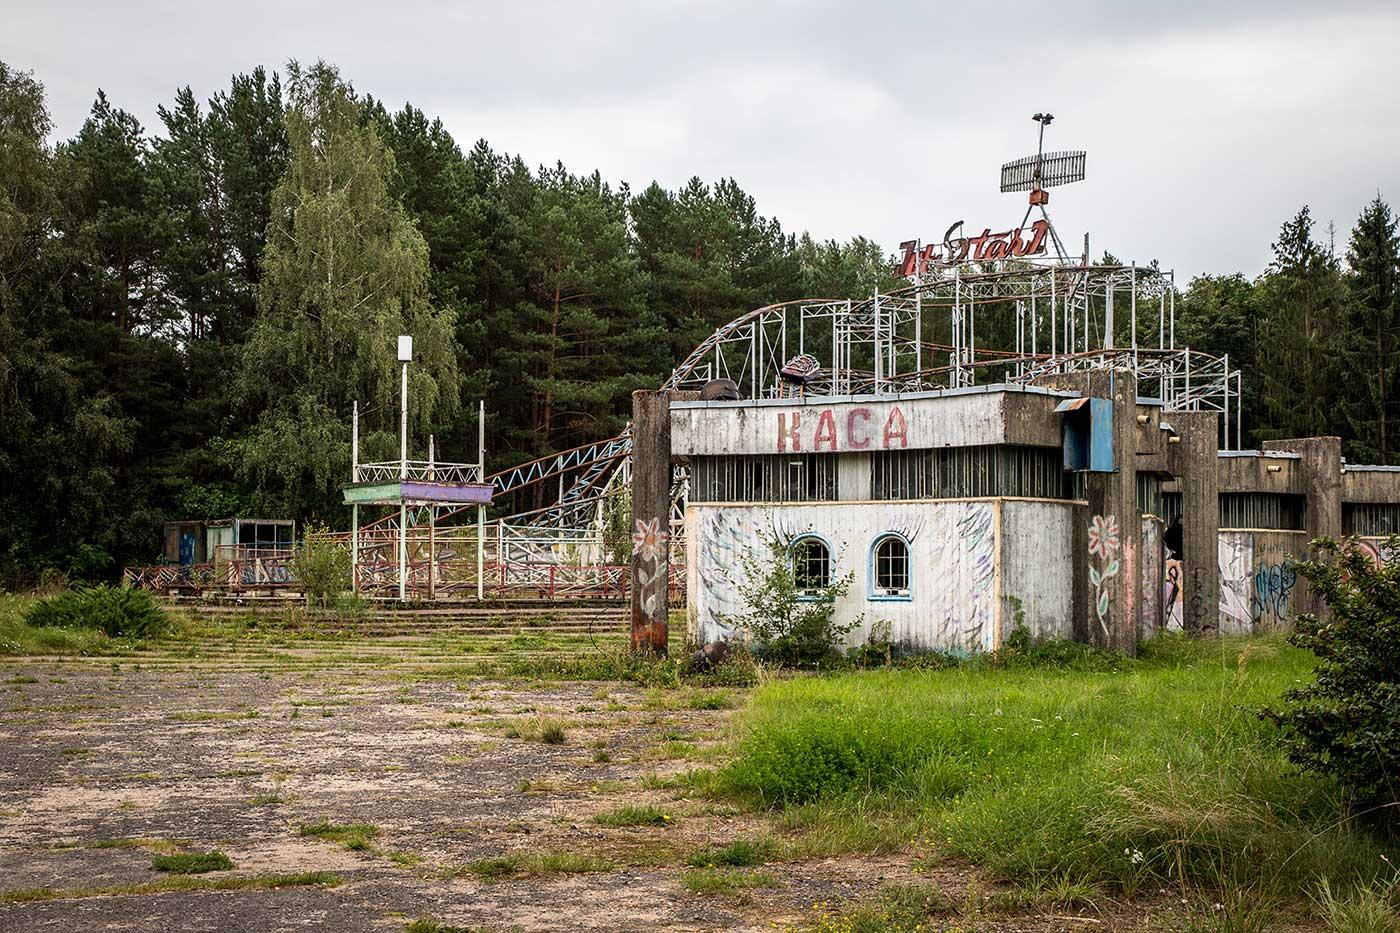 Abandoned Soviet Amusement Park in Elektrėnai, Lithuania.